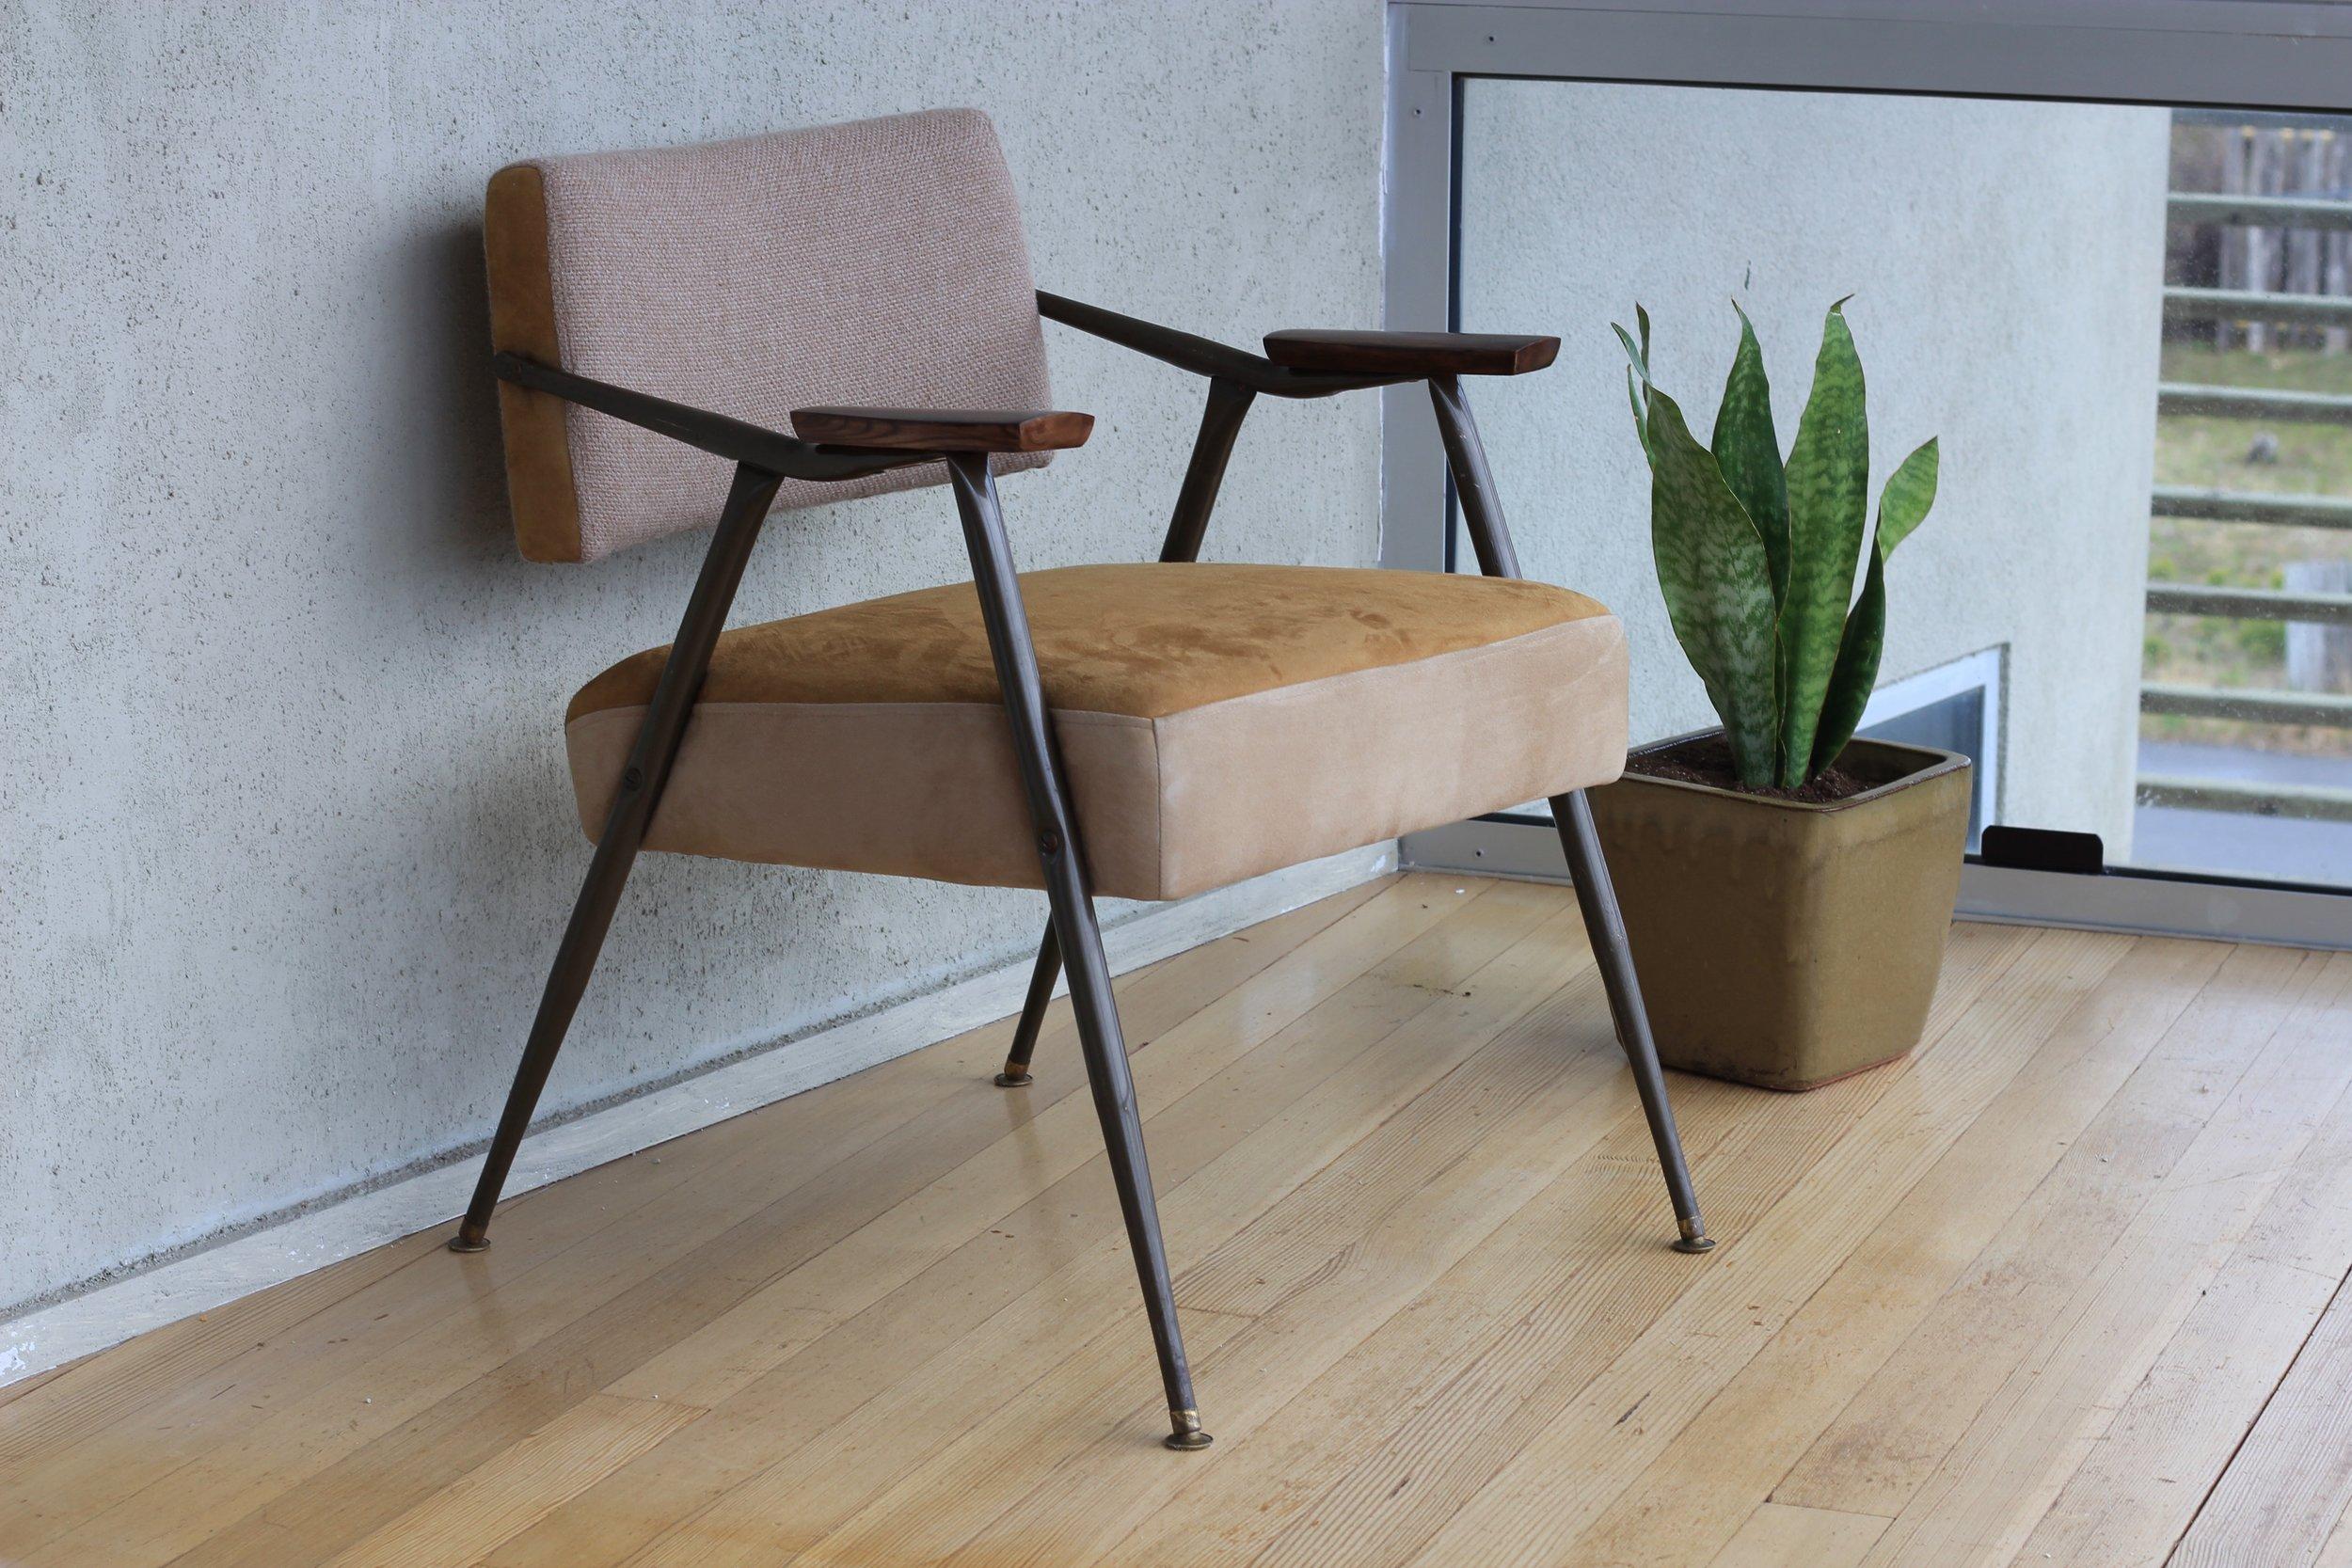 Wood Floor and Chair.jpg